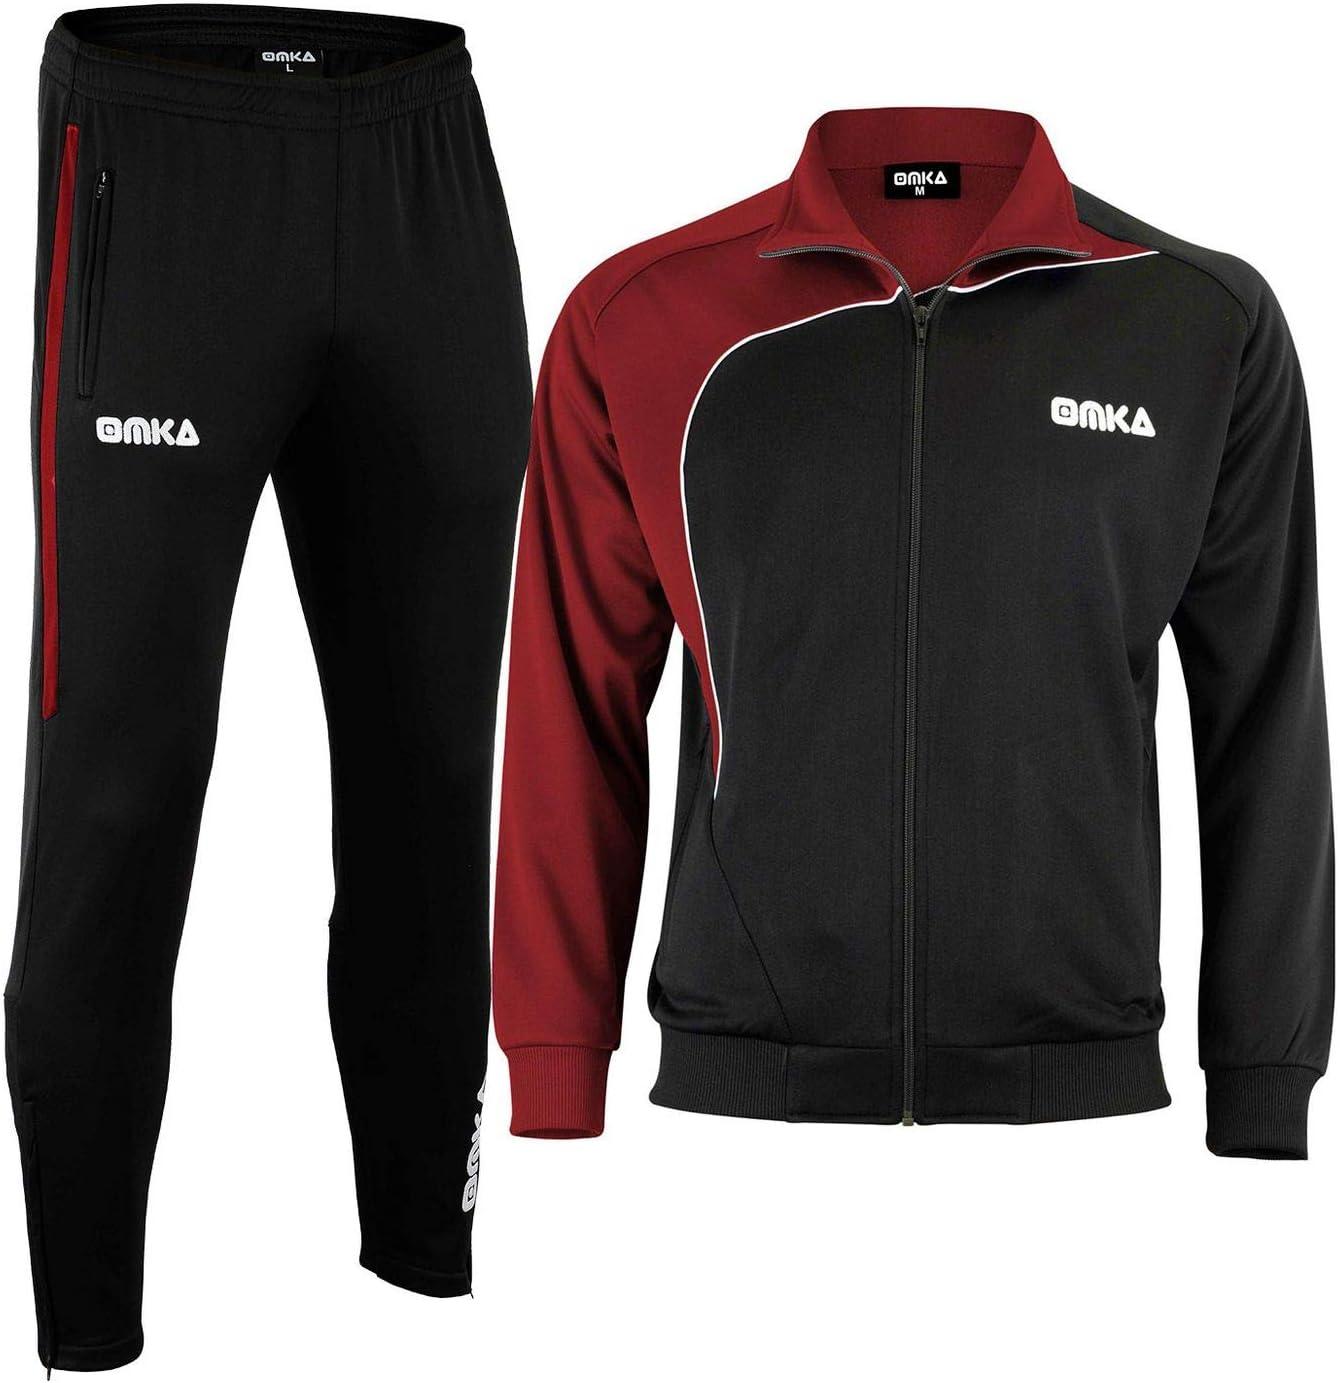 OMKA Trainingsanzug Sportanzug Jogginganzug Freizeitanzug